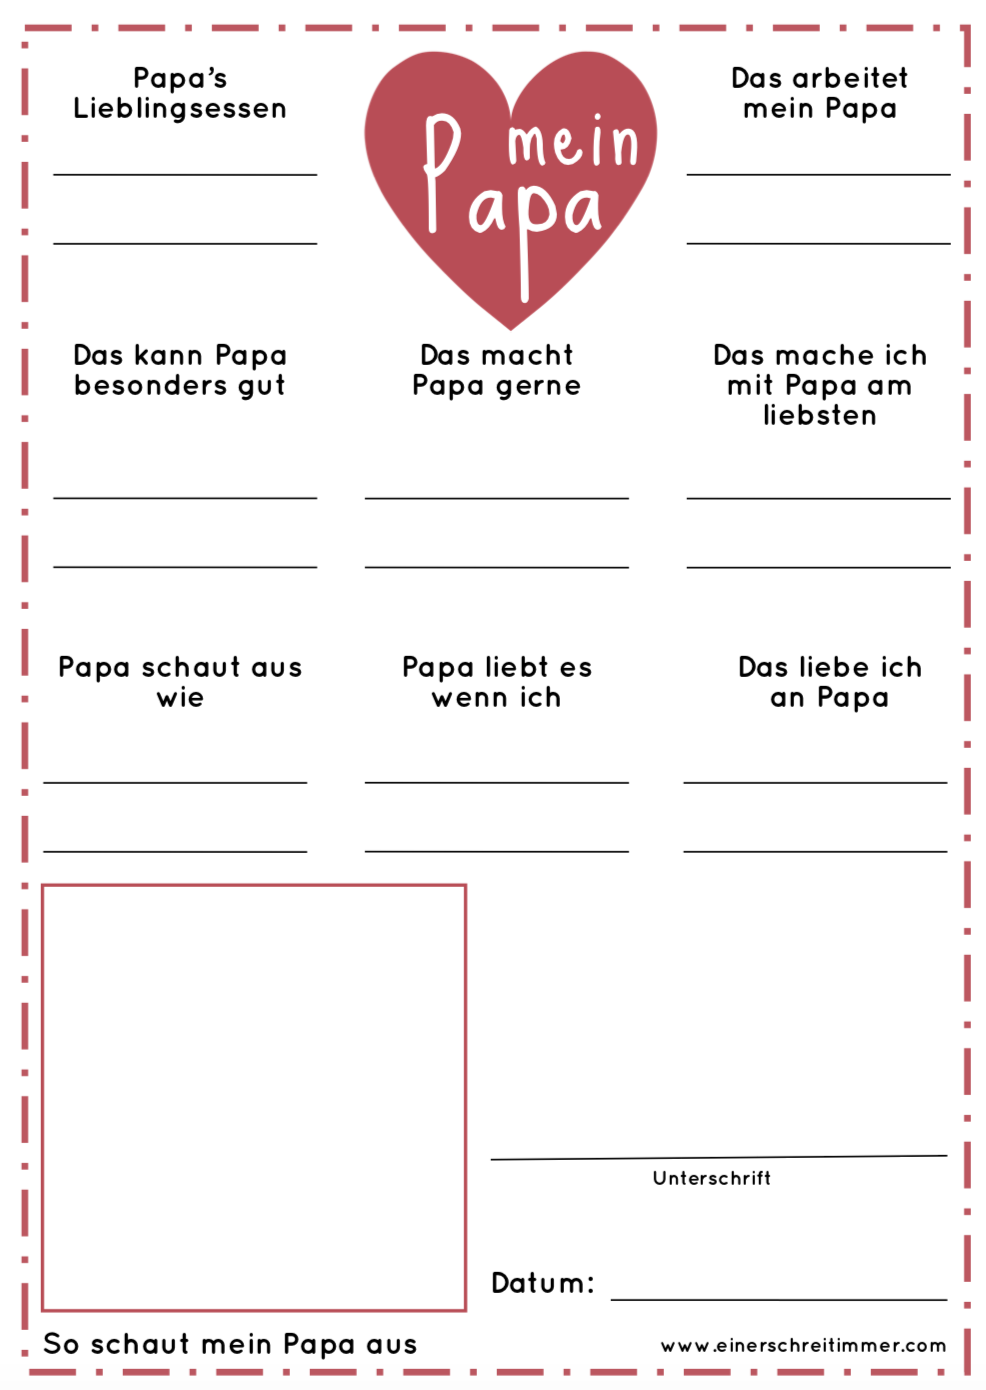 Download Vatertag Fragebogen Fur Papa Helin Fetedesperes En 2020 Fete Des Peres Bricolage Fete Des Meres Bricolage Fete Des Peres